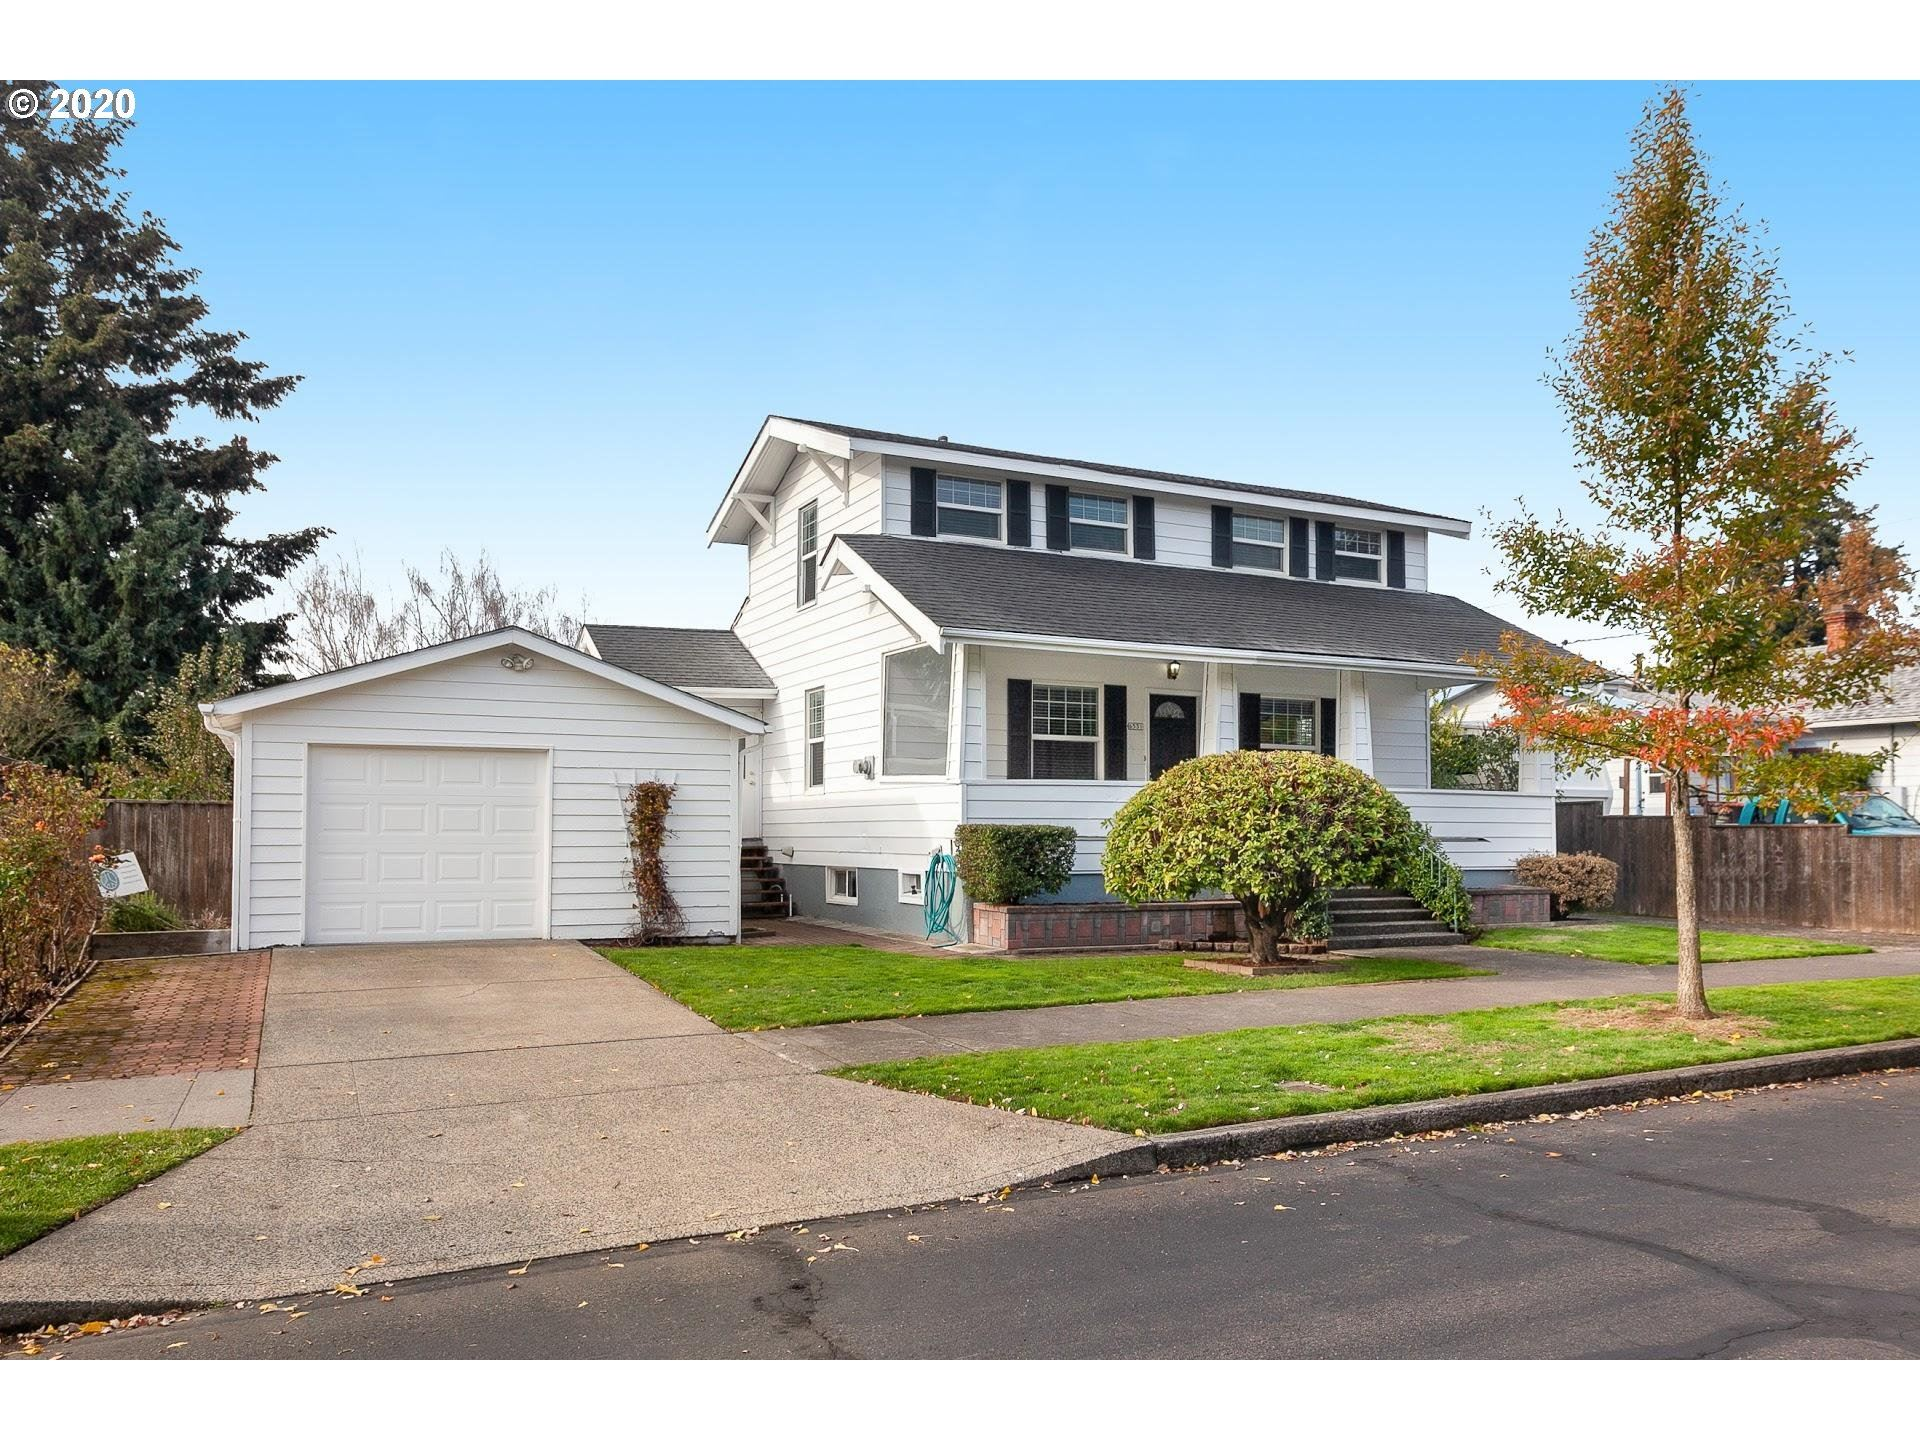 6531 SE 42ND AVE, Portland, OR 97206 - MLS#: 20250742